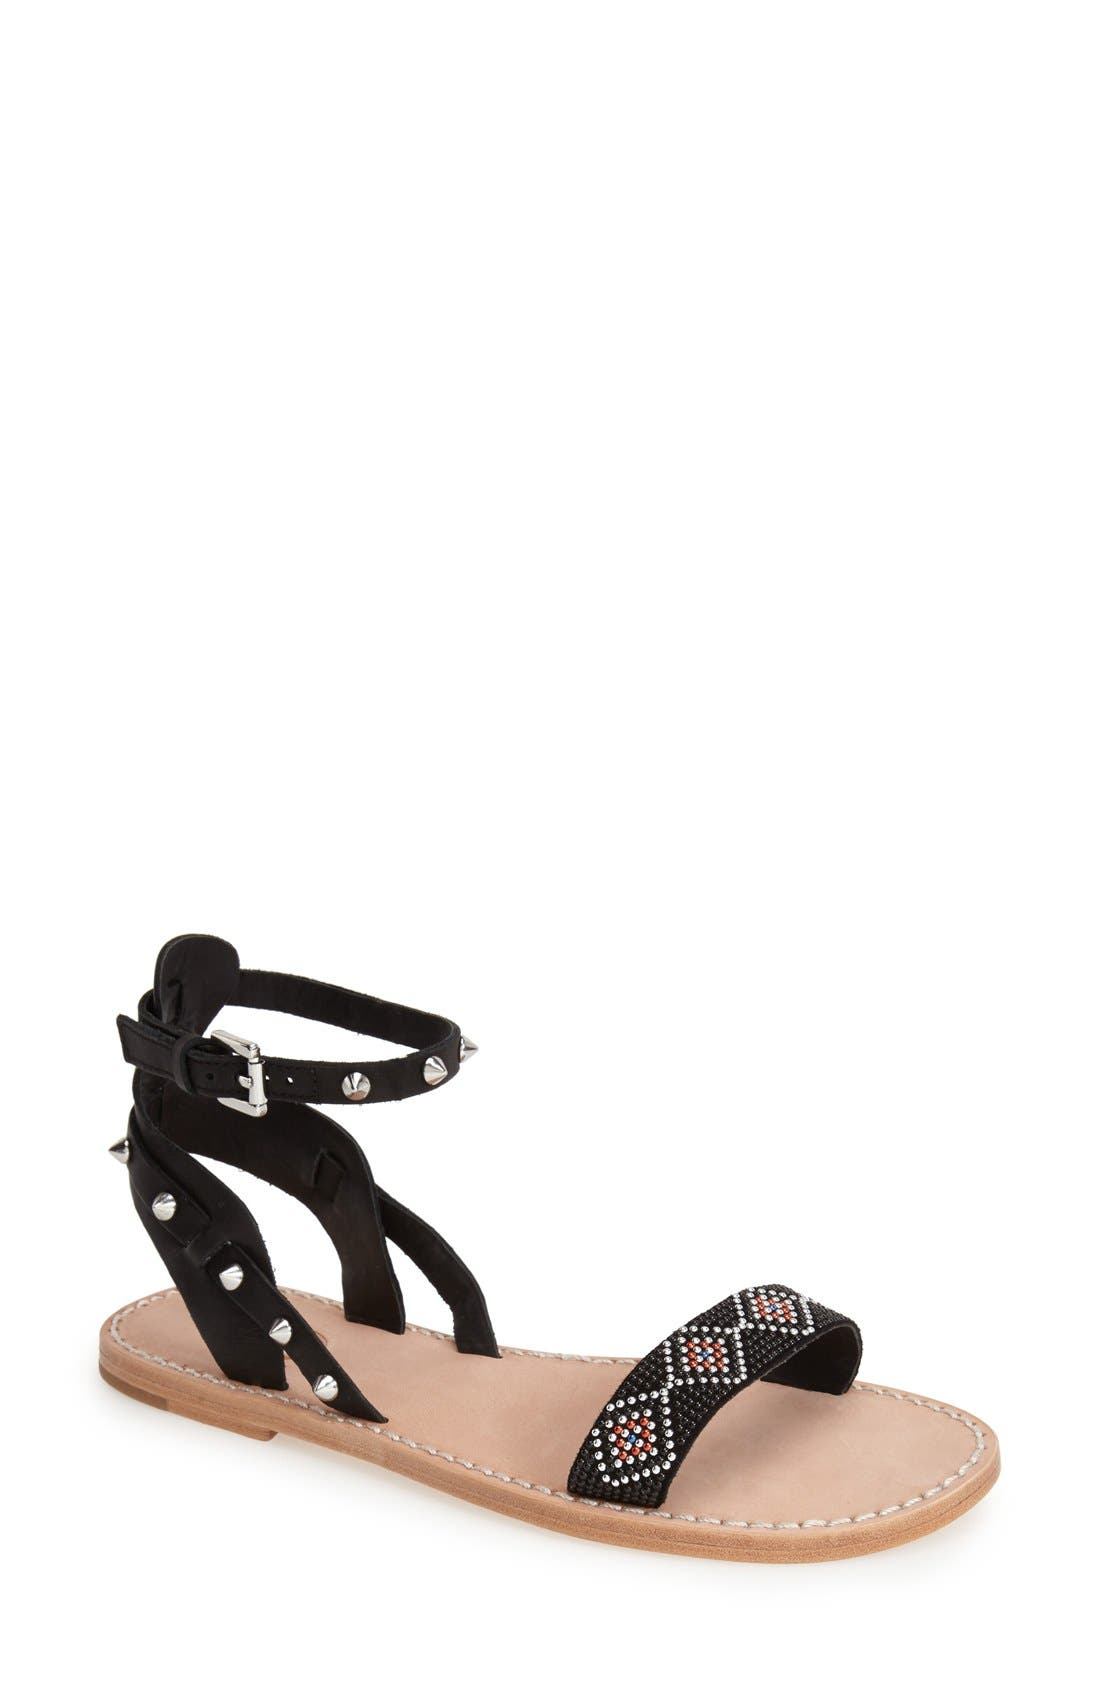 Alternate Image 1 Selected - Ash 'Pearl' Studded Leather Sandal (Women)